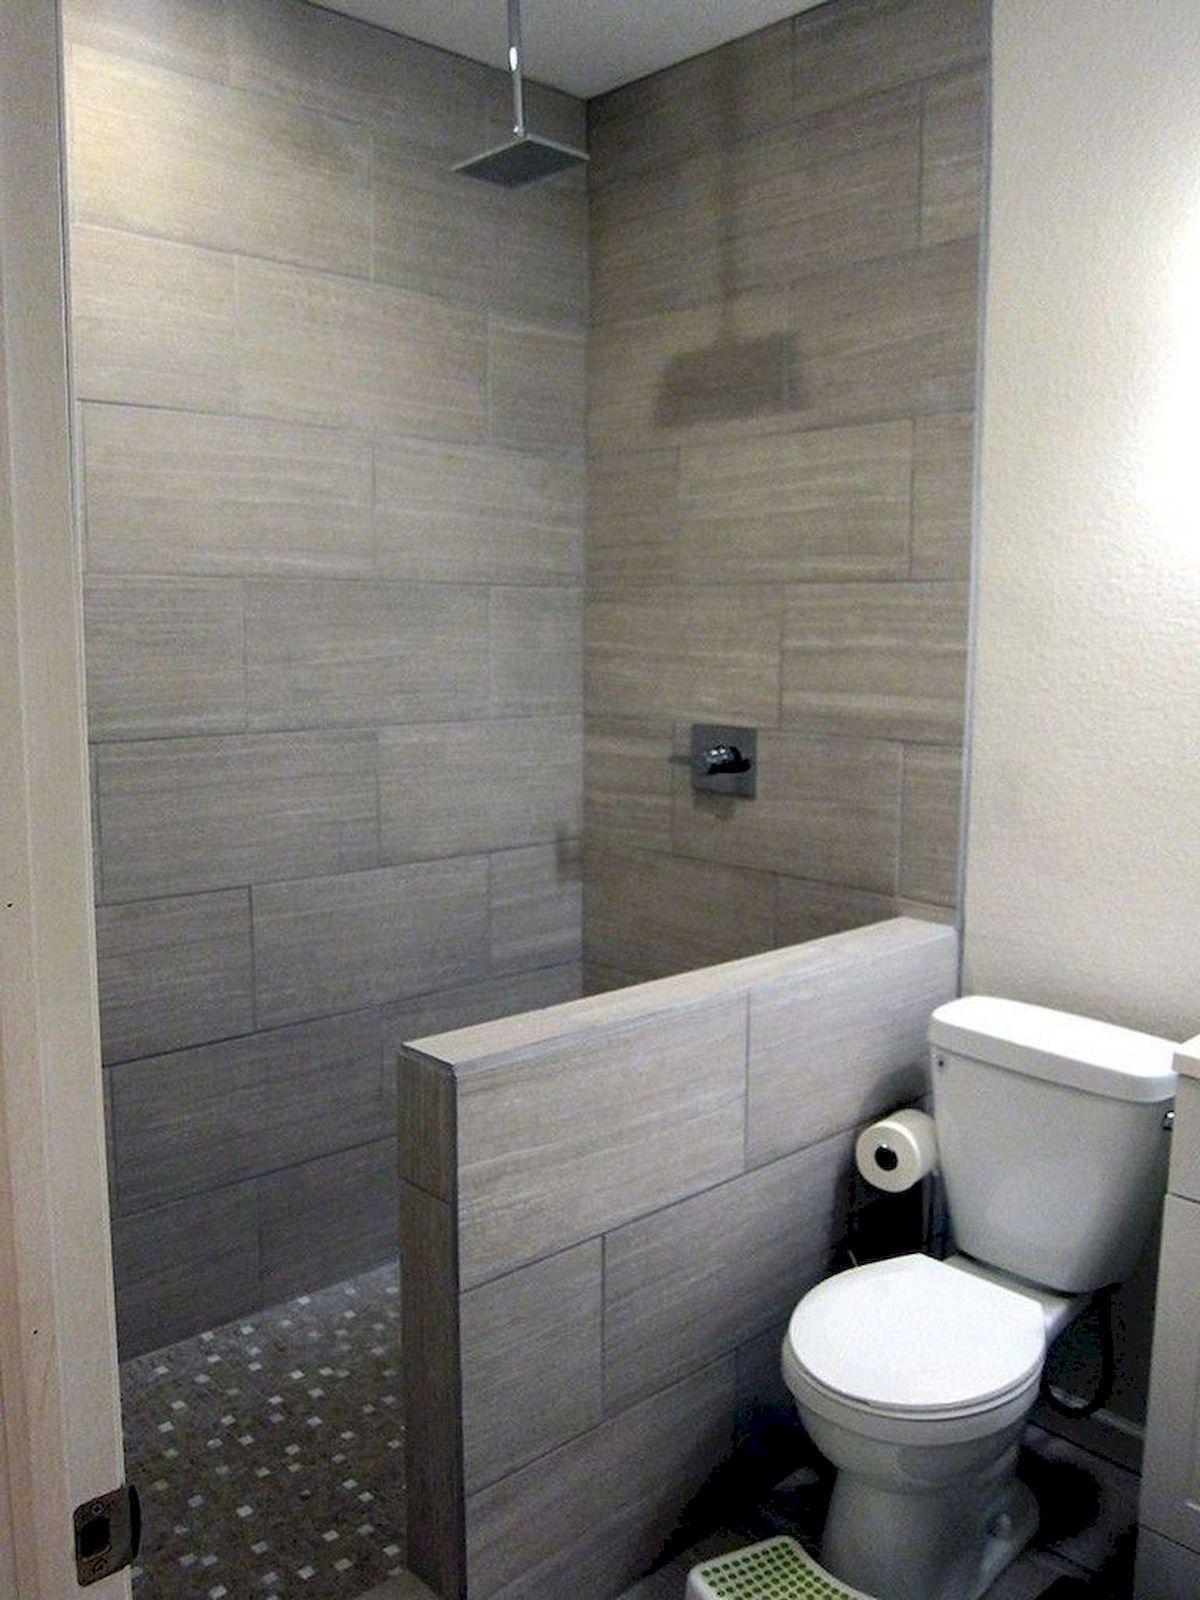 Stunning Small Bathroom Ideas On A Budget 14 Bathroom Design